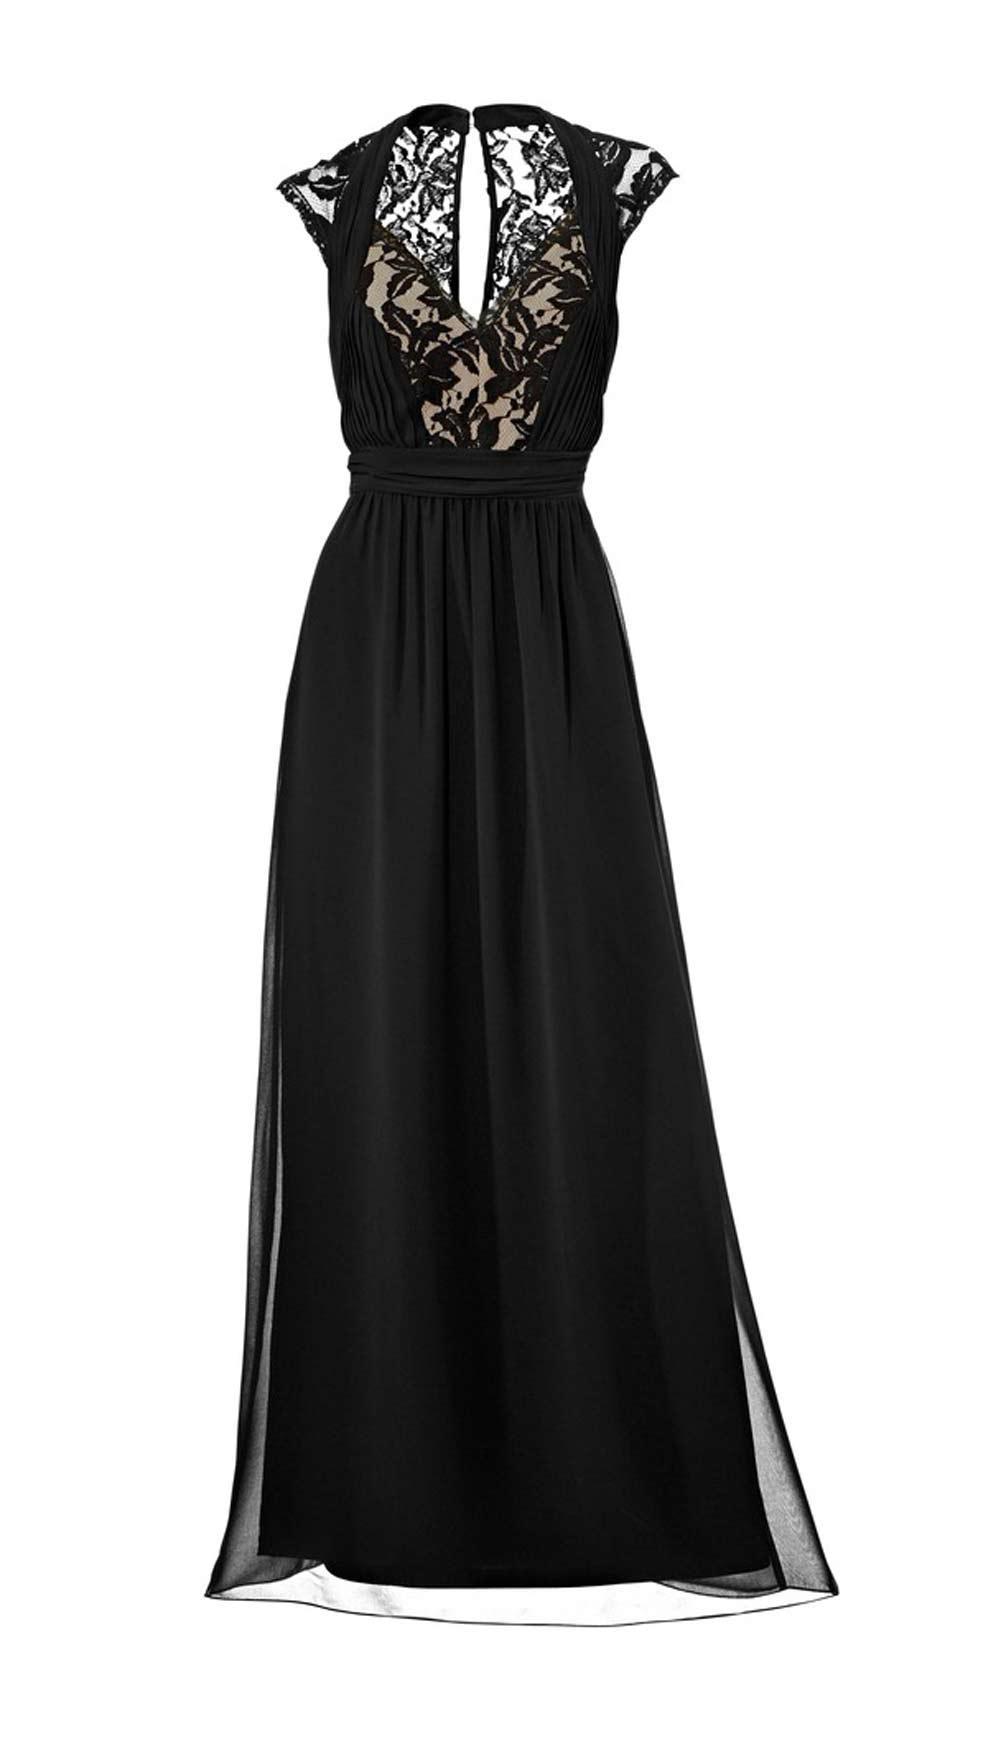 Designer-Abendkleid mit Spitze schwarz | Abendmode | Outlet Mode-Shop